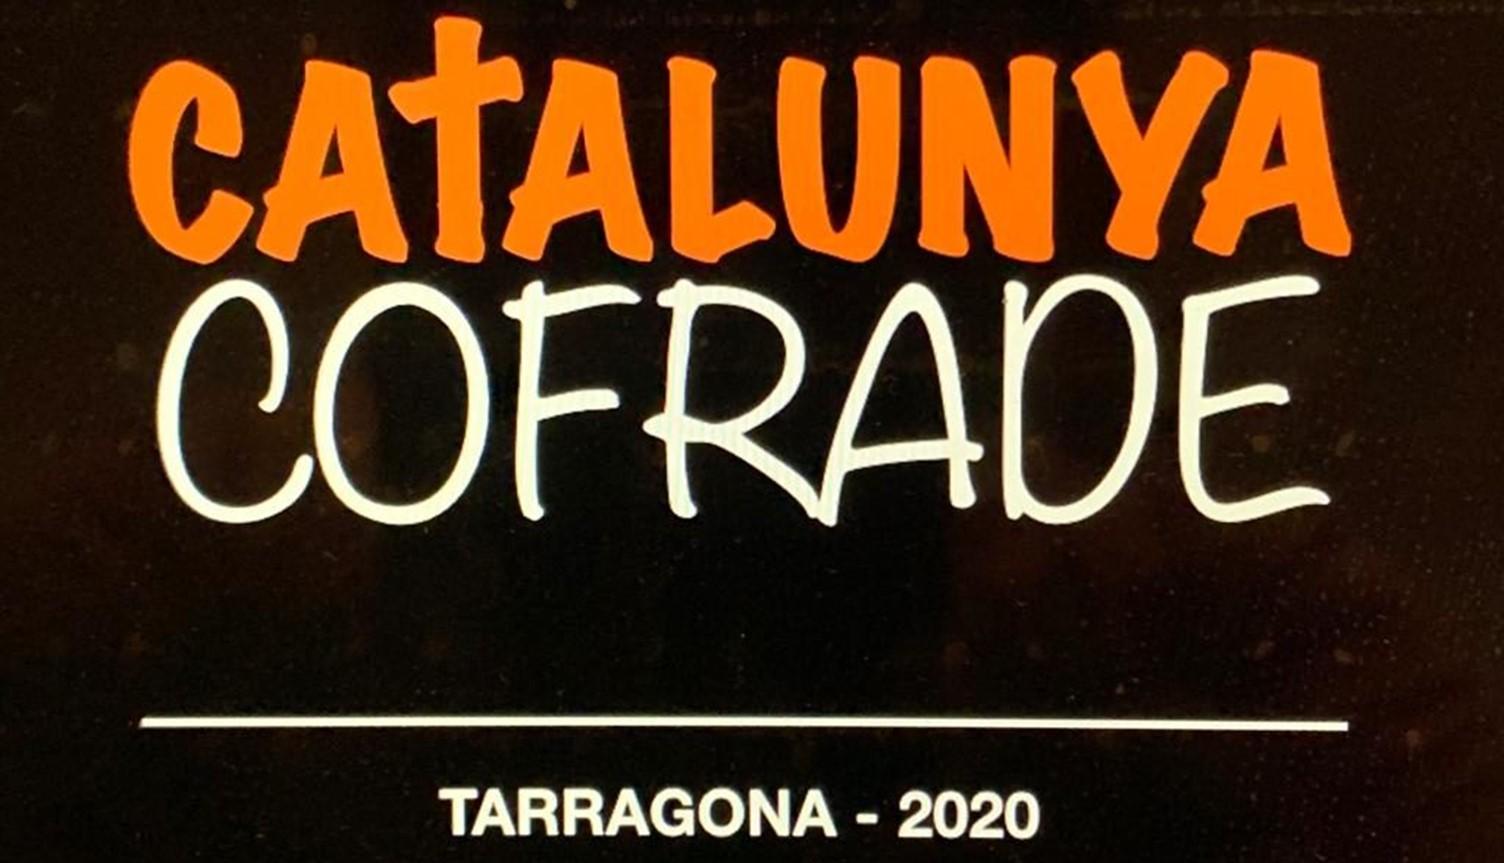 Catalunya Cofrade